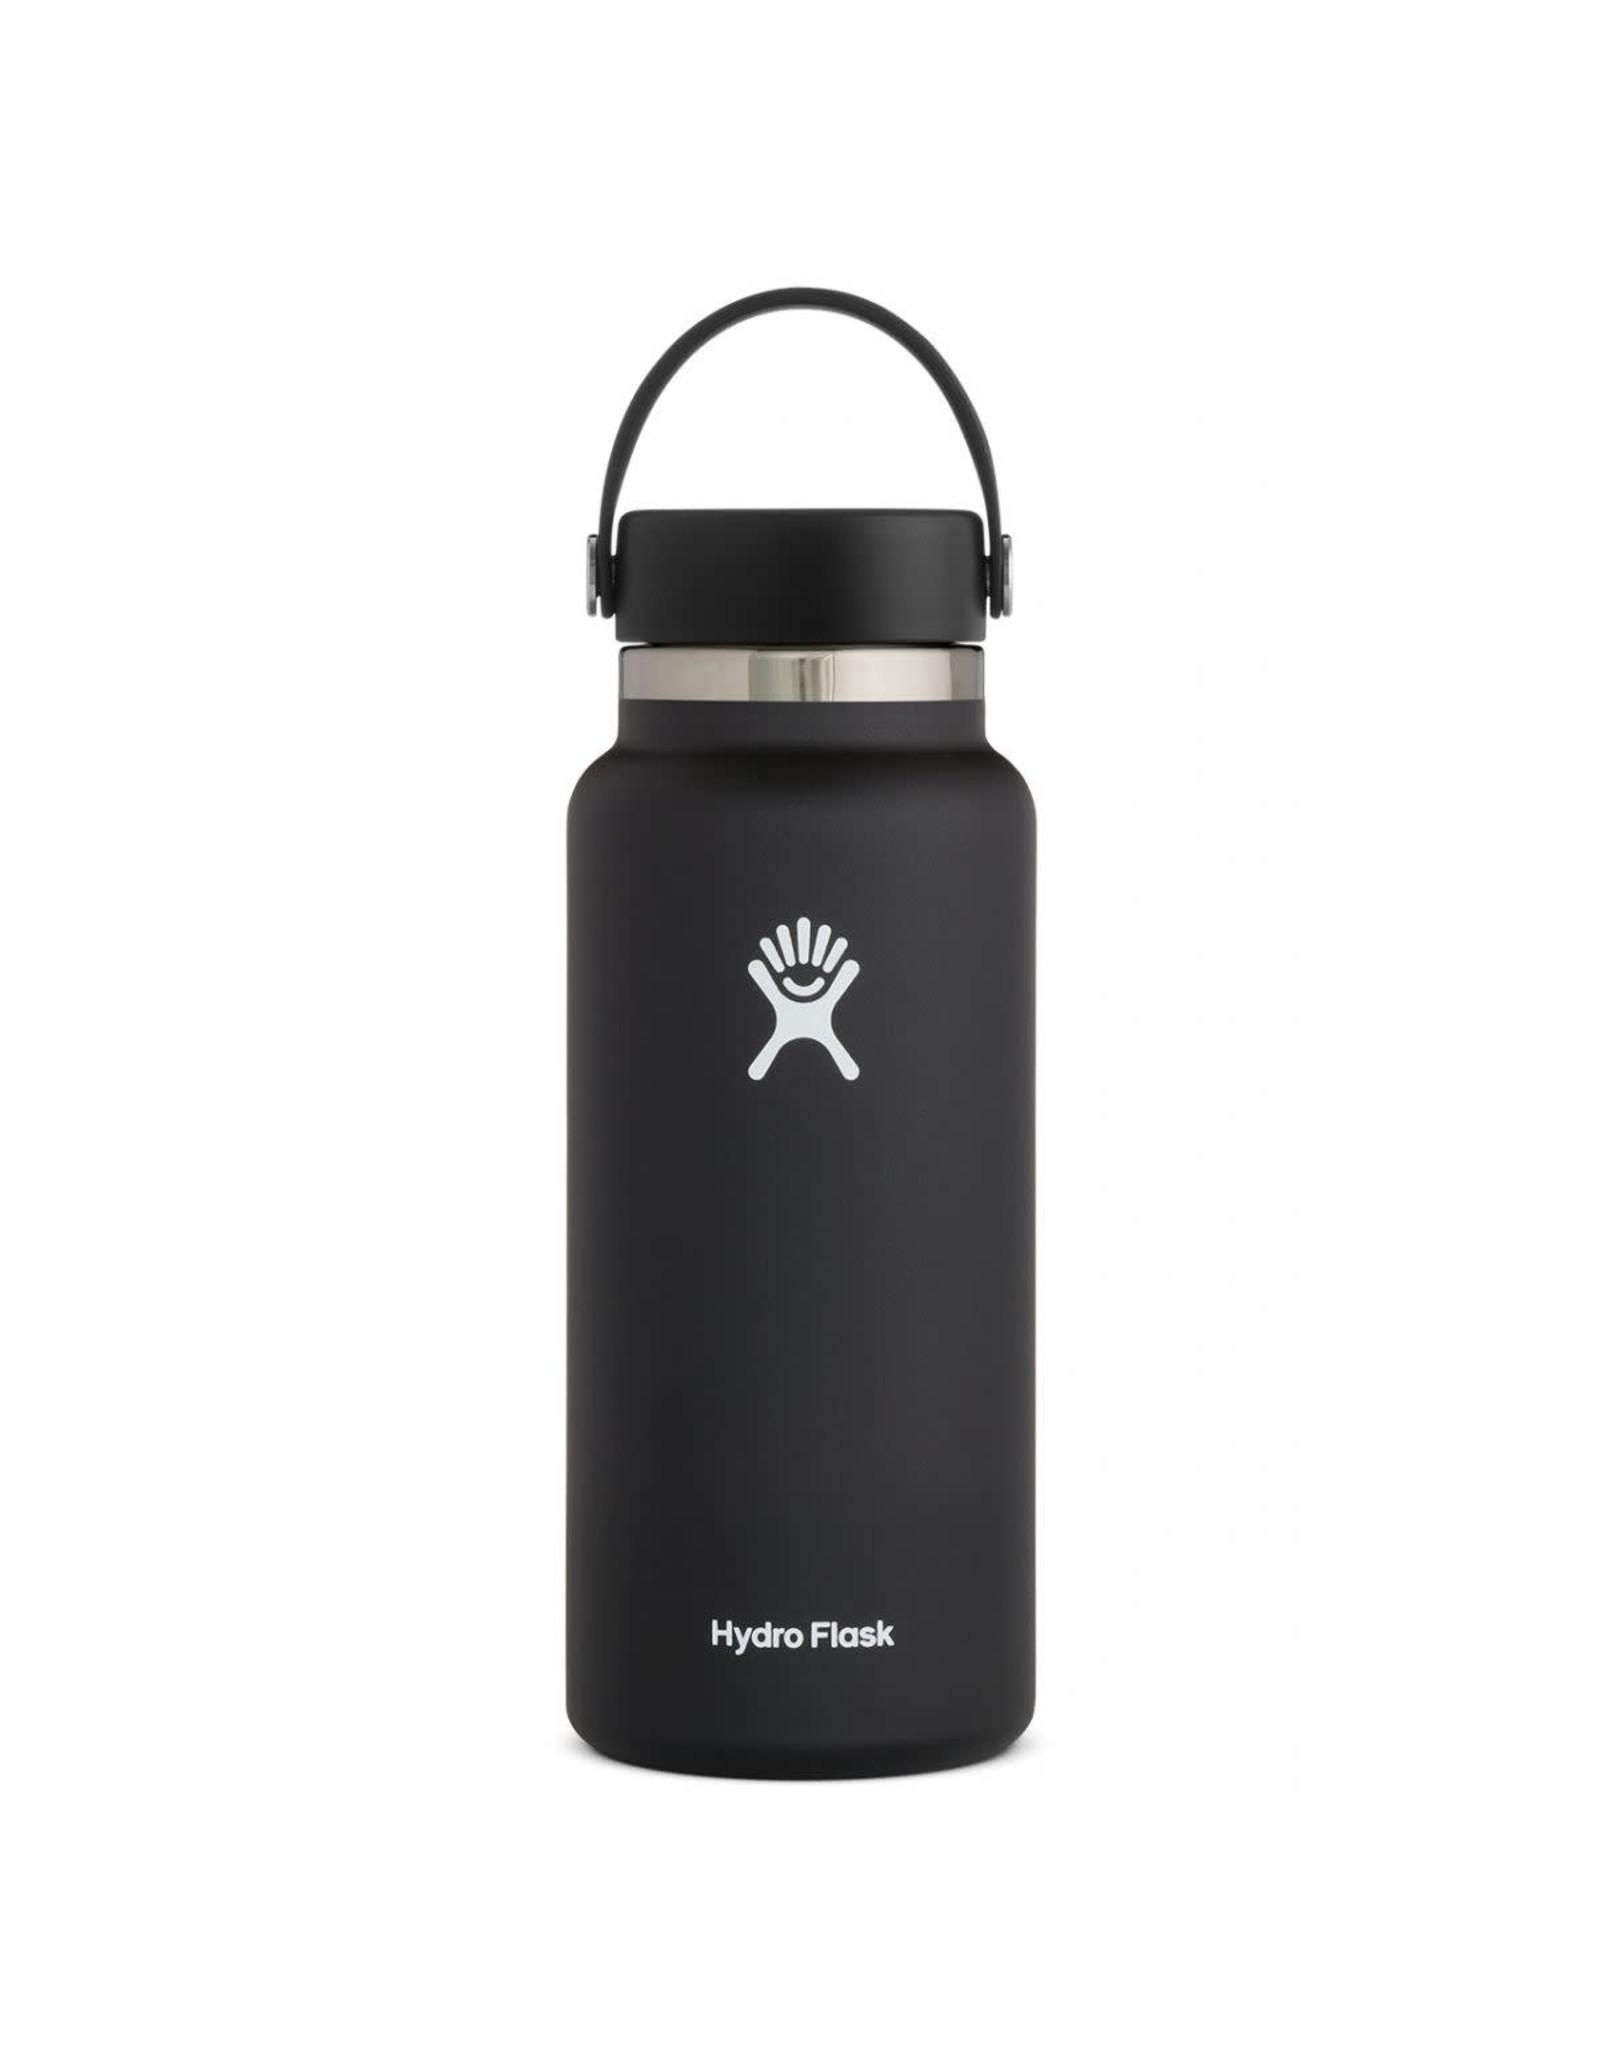 Hydro Flask Hydro Flask 32oz Wide Mouth w/ Flex Cap Black